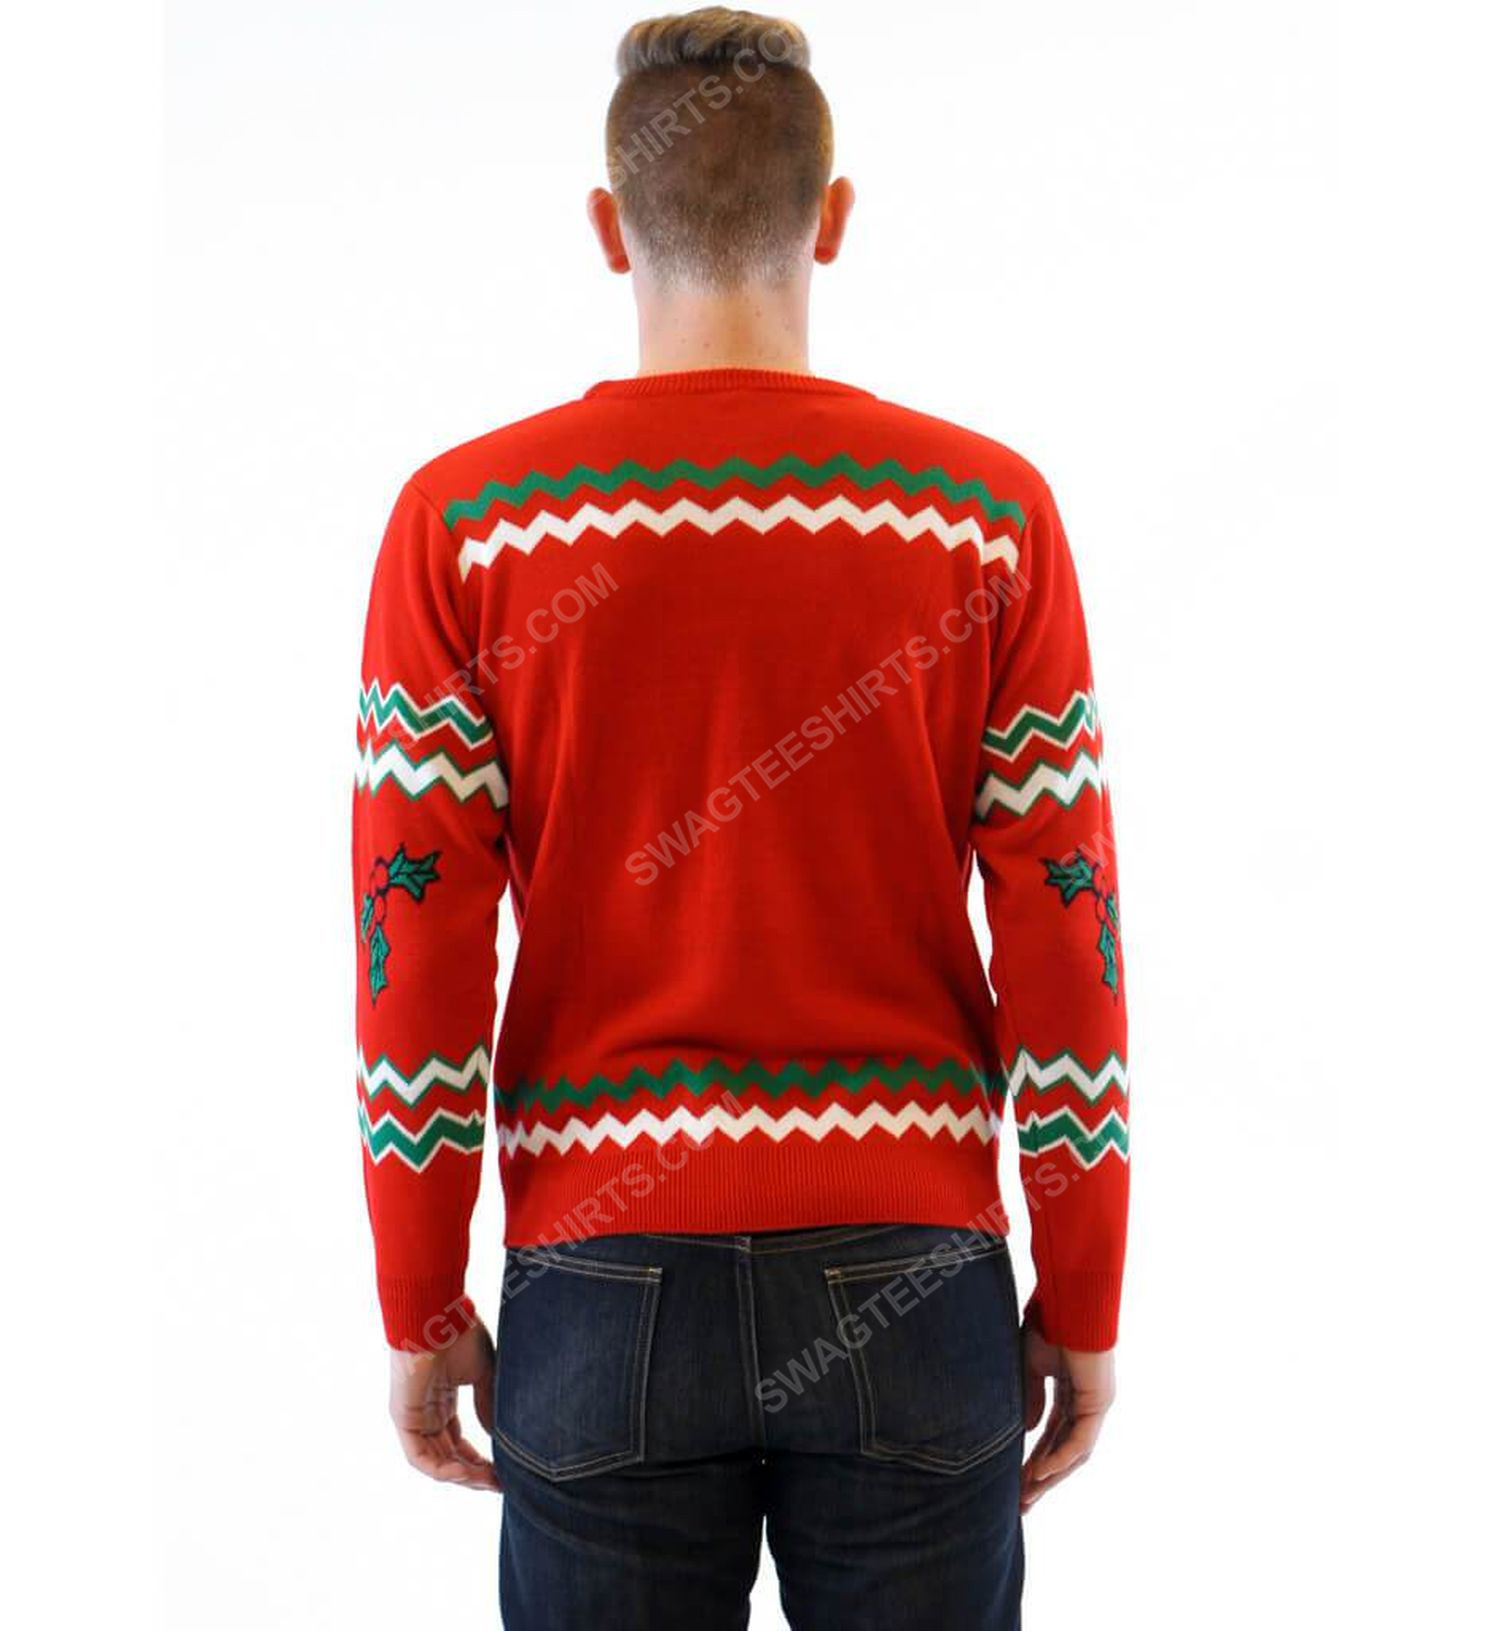 Let's get elfed up drunken elves full print ugly christmas sweater 3 - Copy